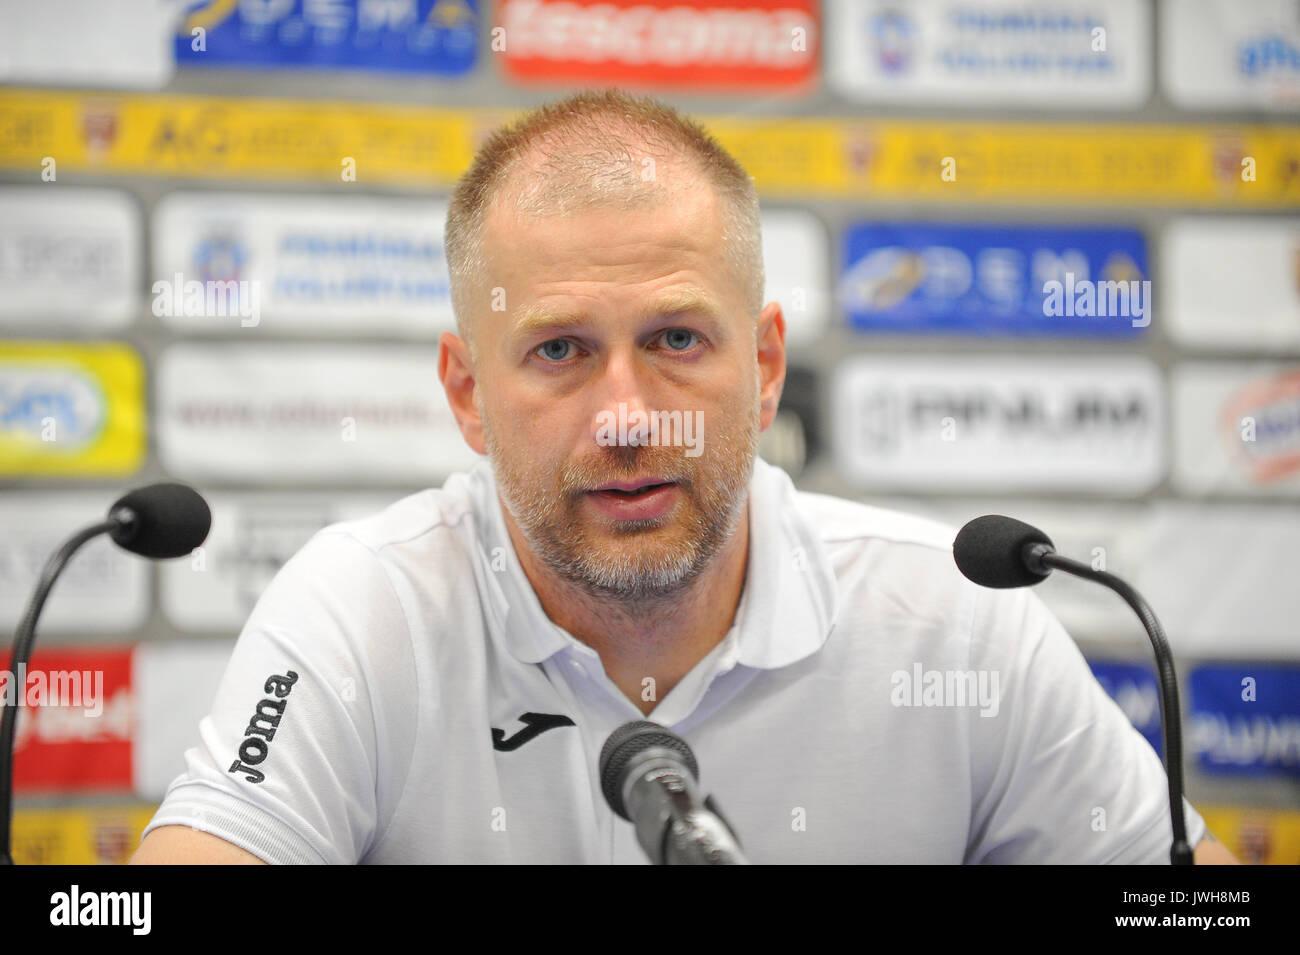 Edward Iordanescu, the head coach of FC Astra Giurgiu - Liga 1 (Romanian Football League One) game between FC Voluntari - Stock Image